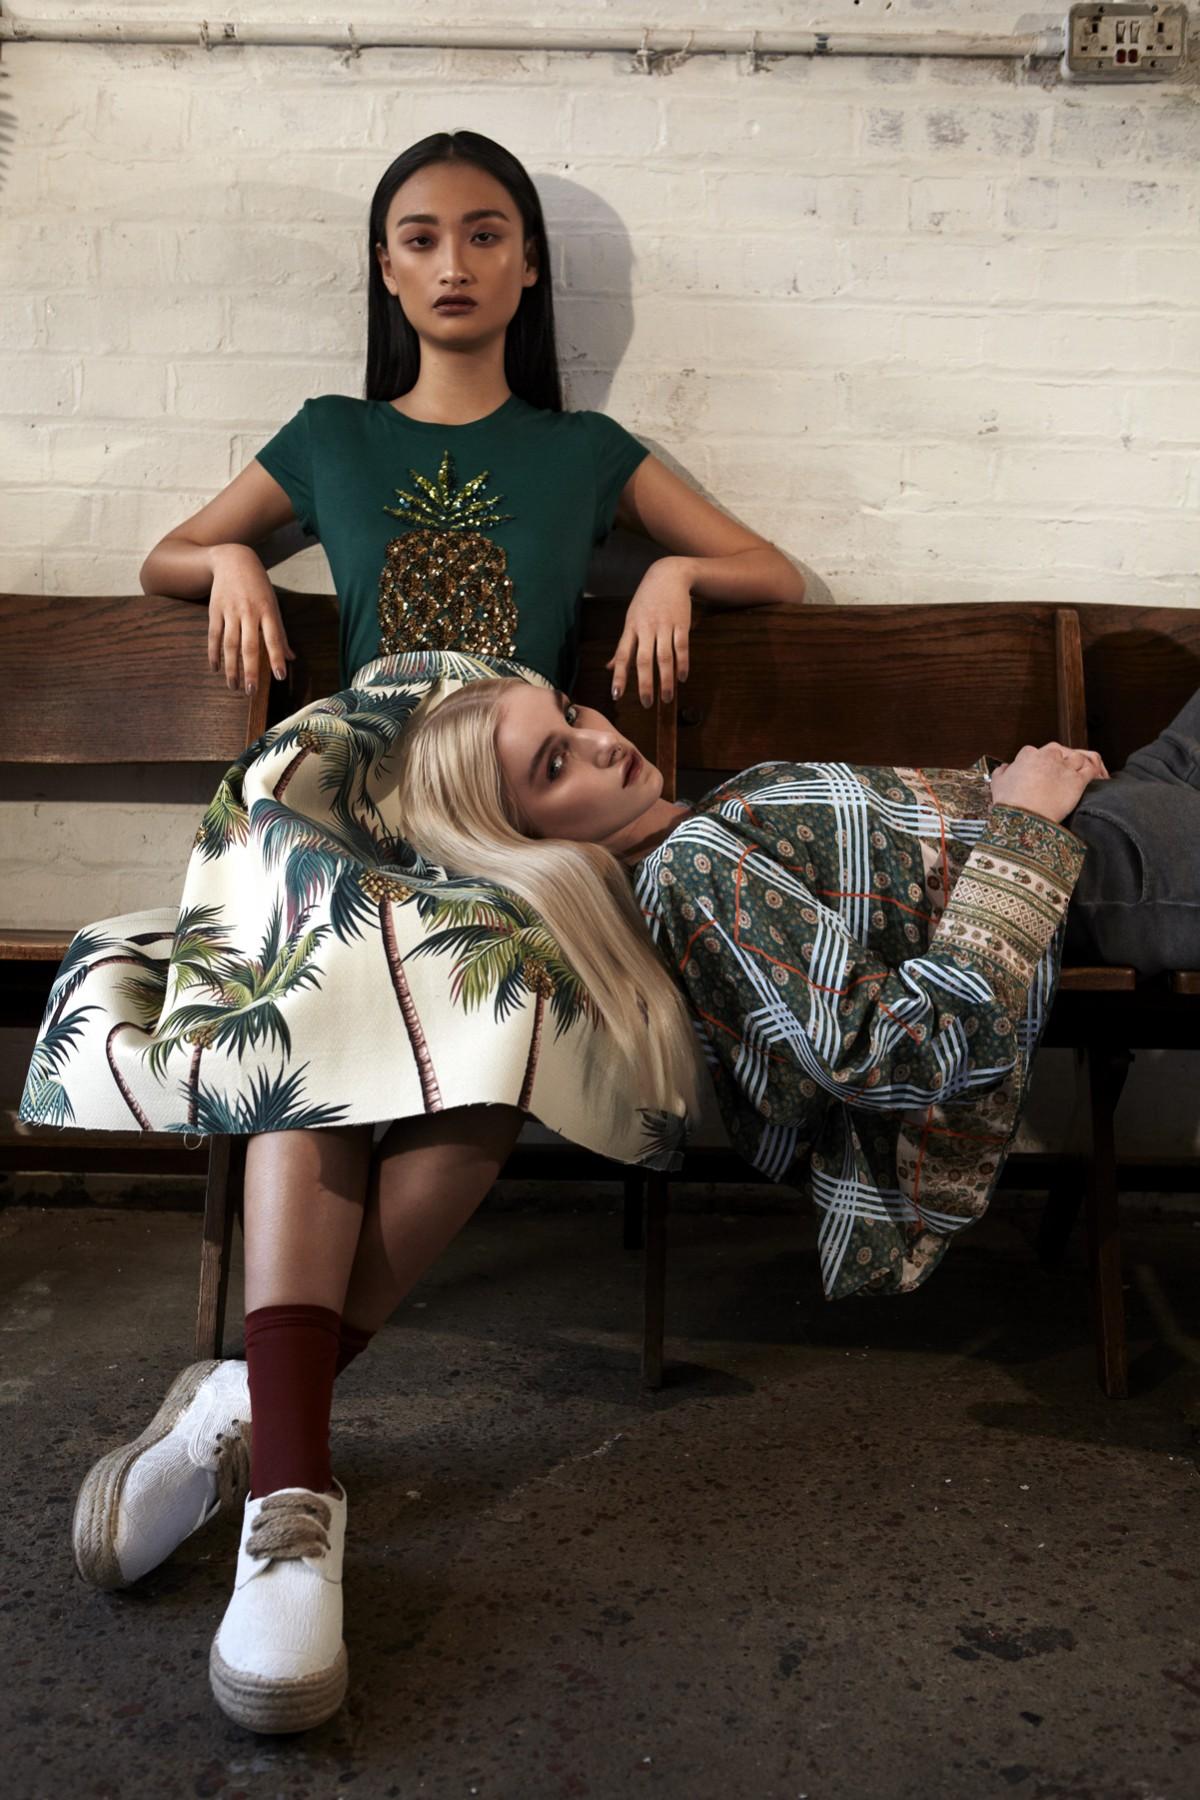 Ioannis Koussertari_photographer_print-factory-Geist-magazine-4-1200x1800.jpg